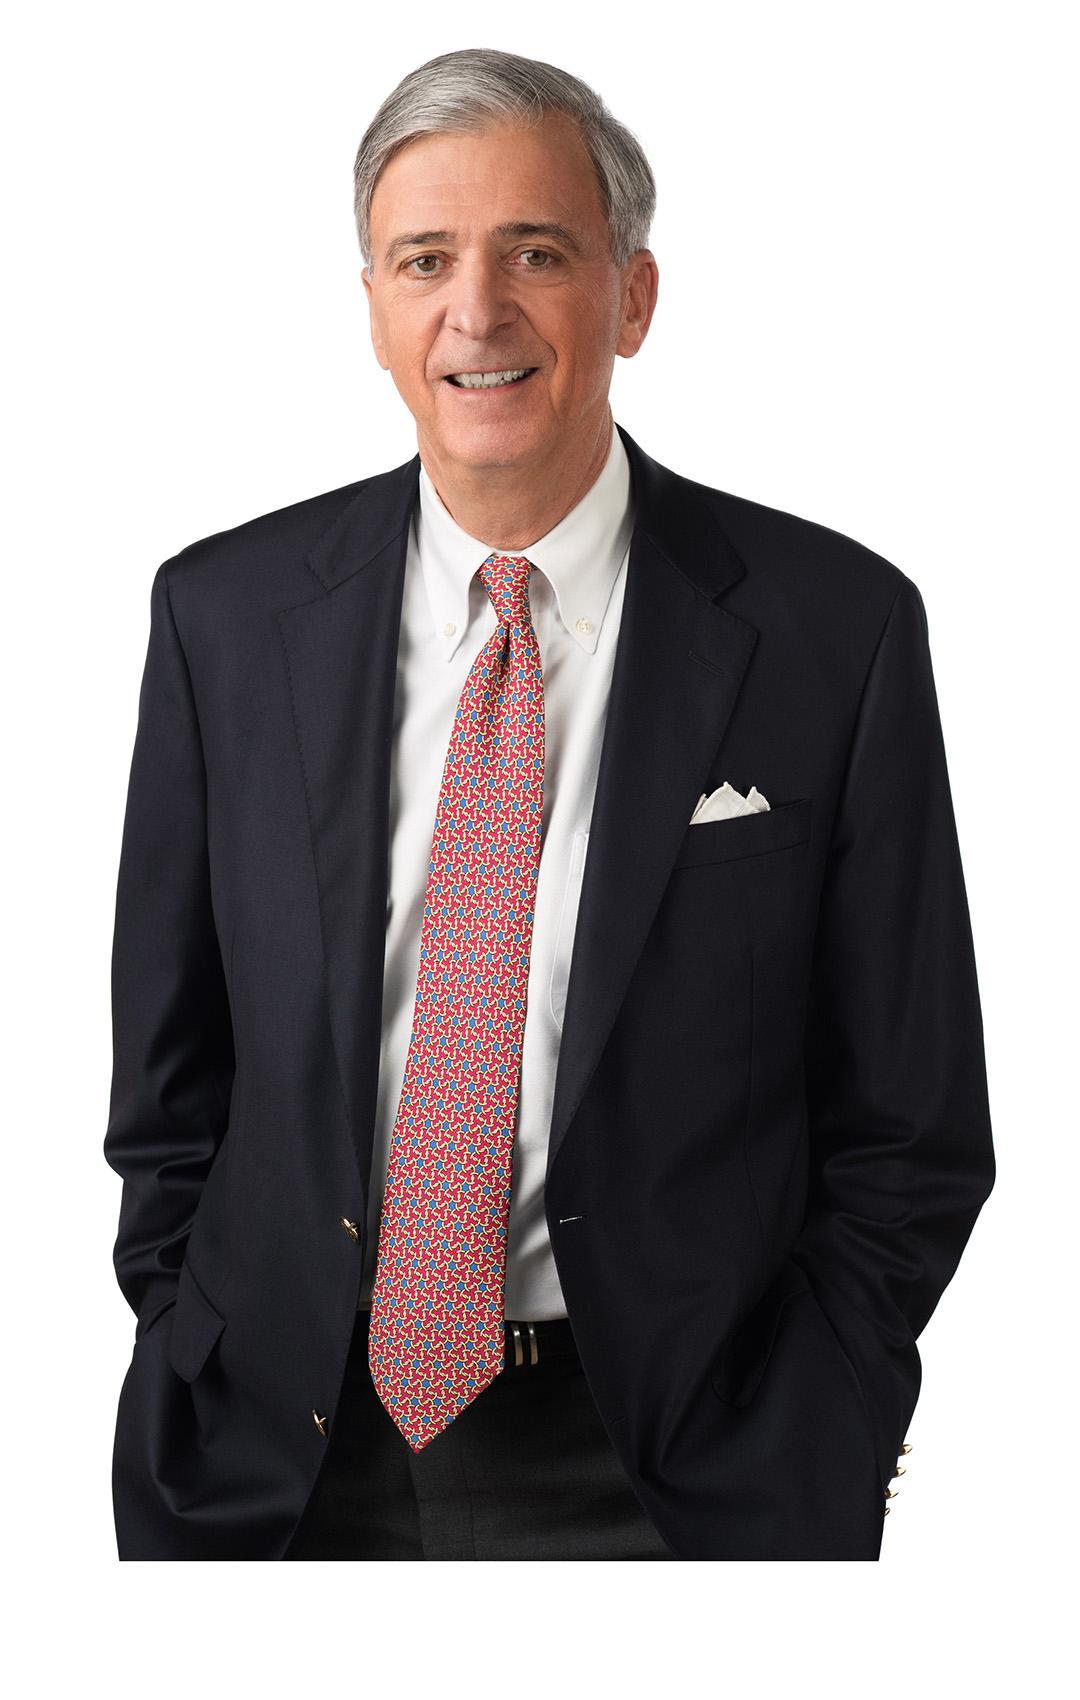 Richard K. Hines, V